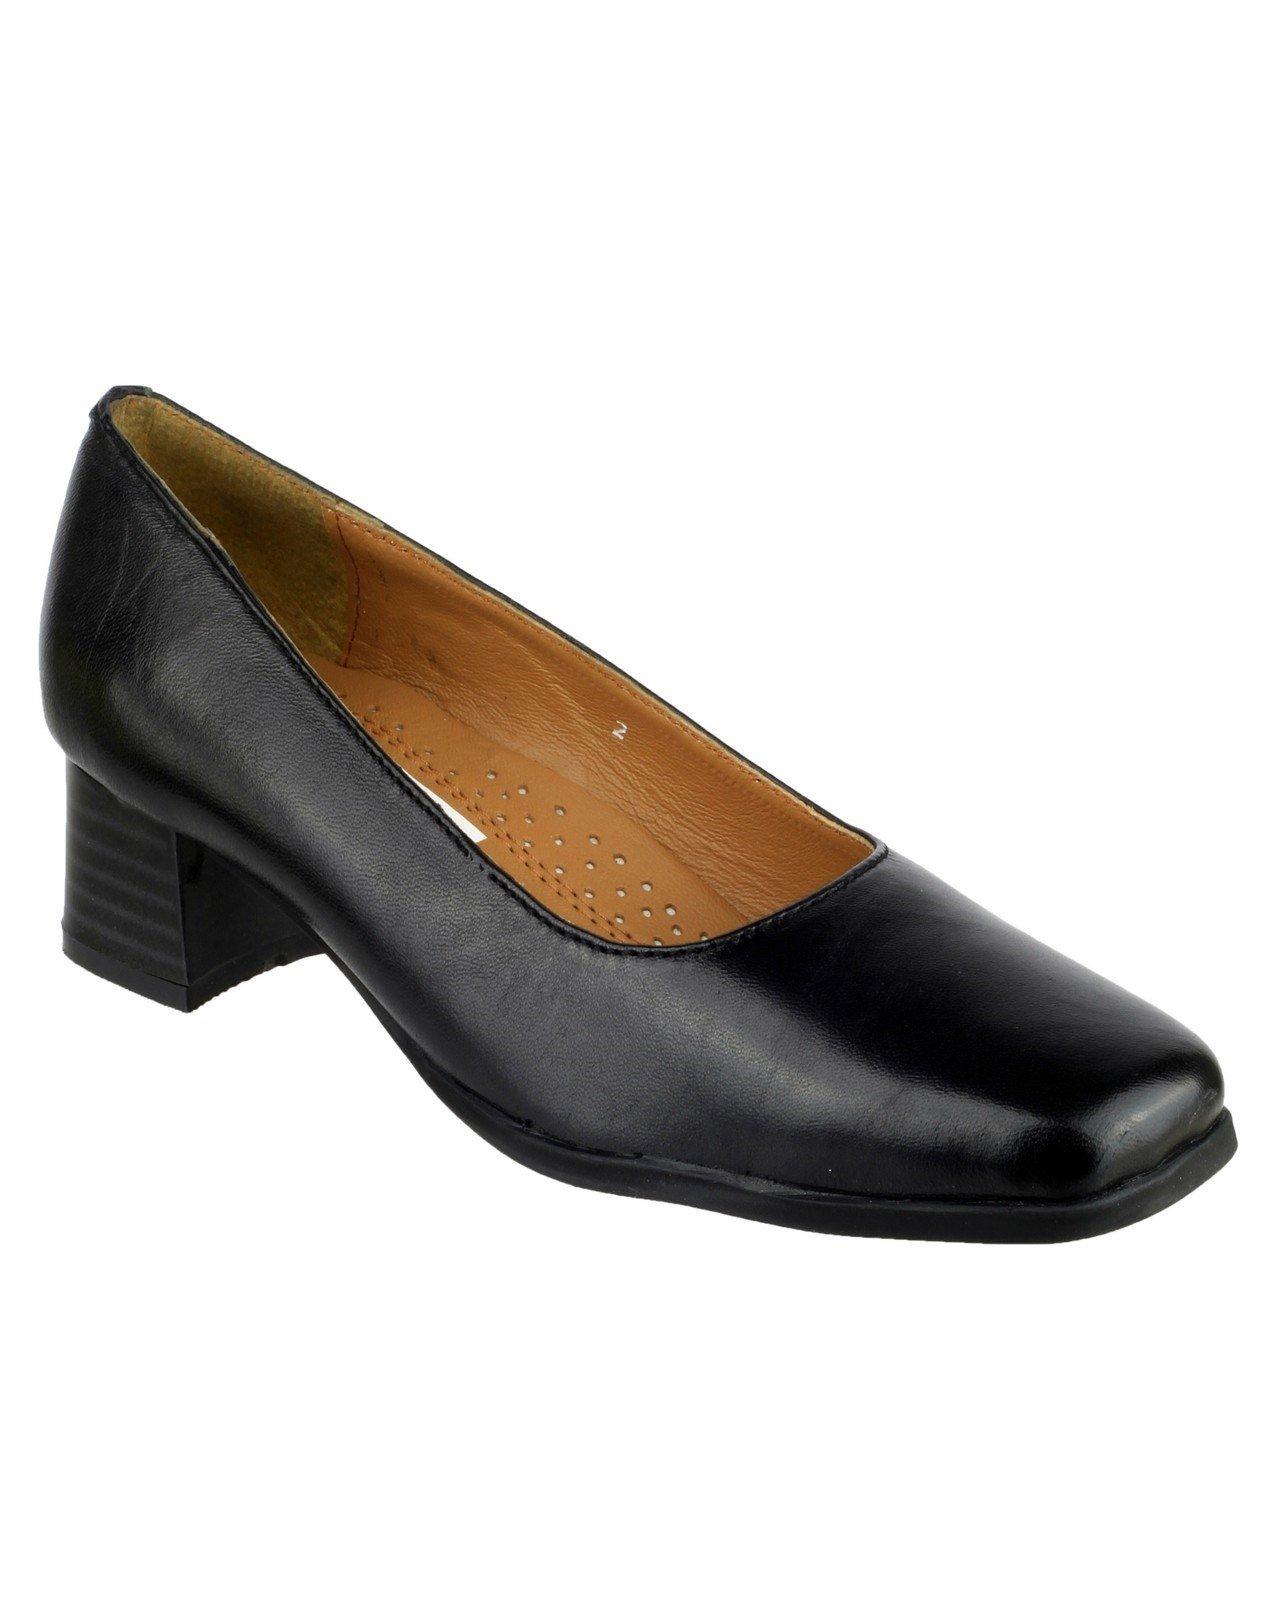 Amblers Women's Walford Court Shoe Black 15904 - Black 2